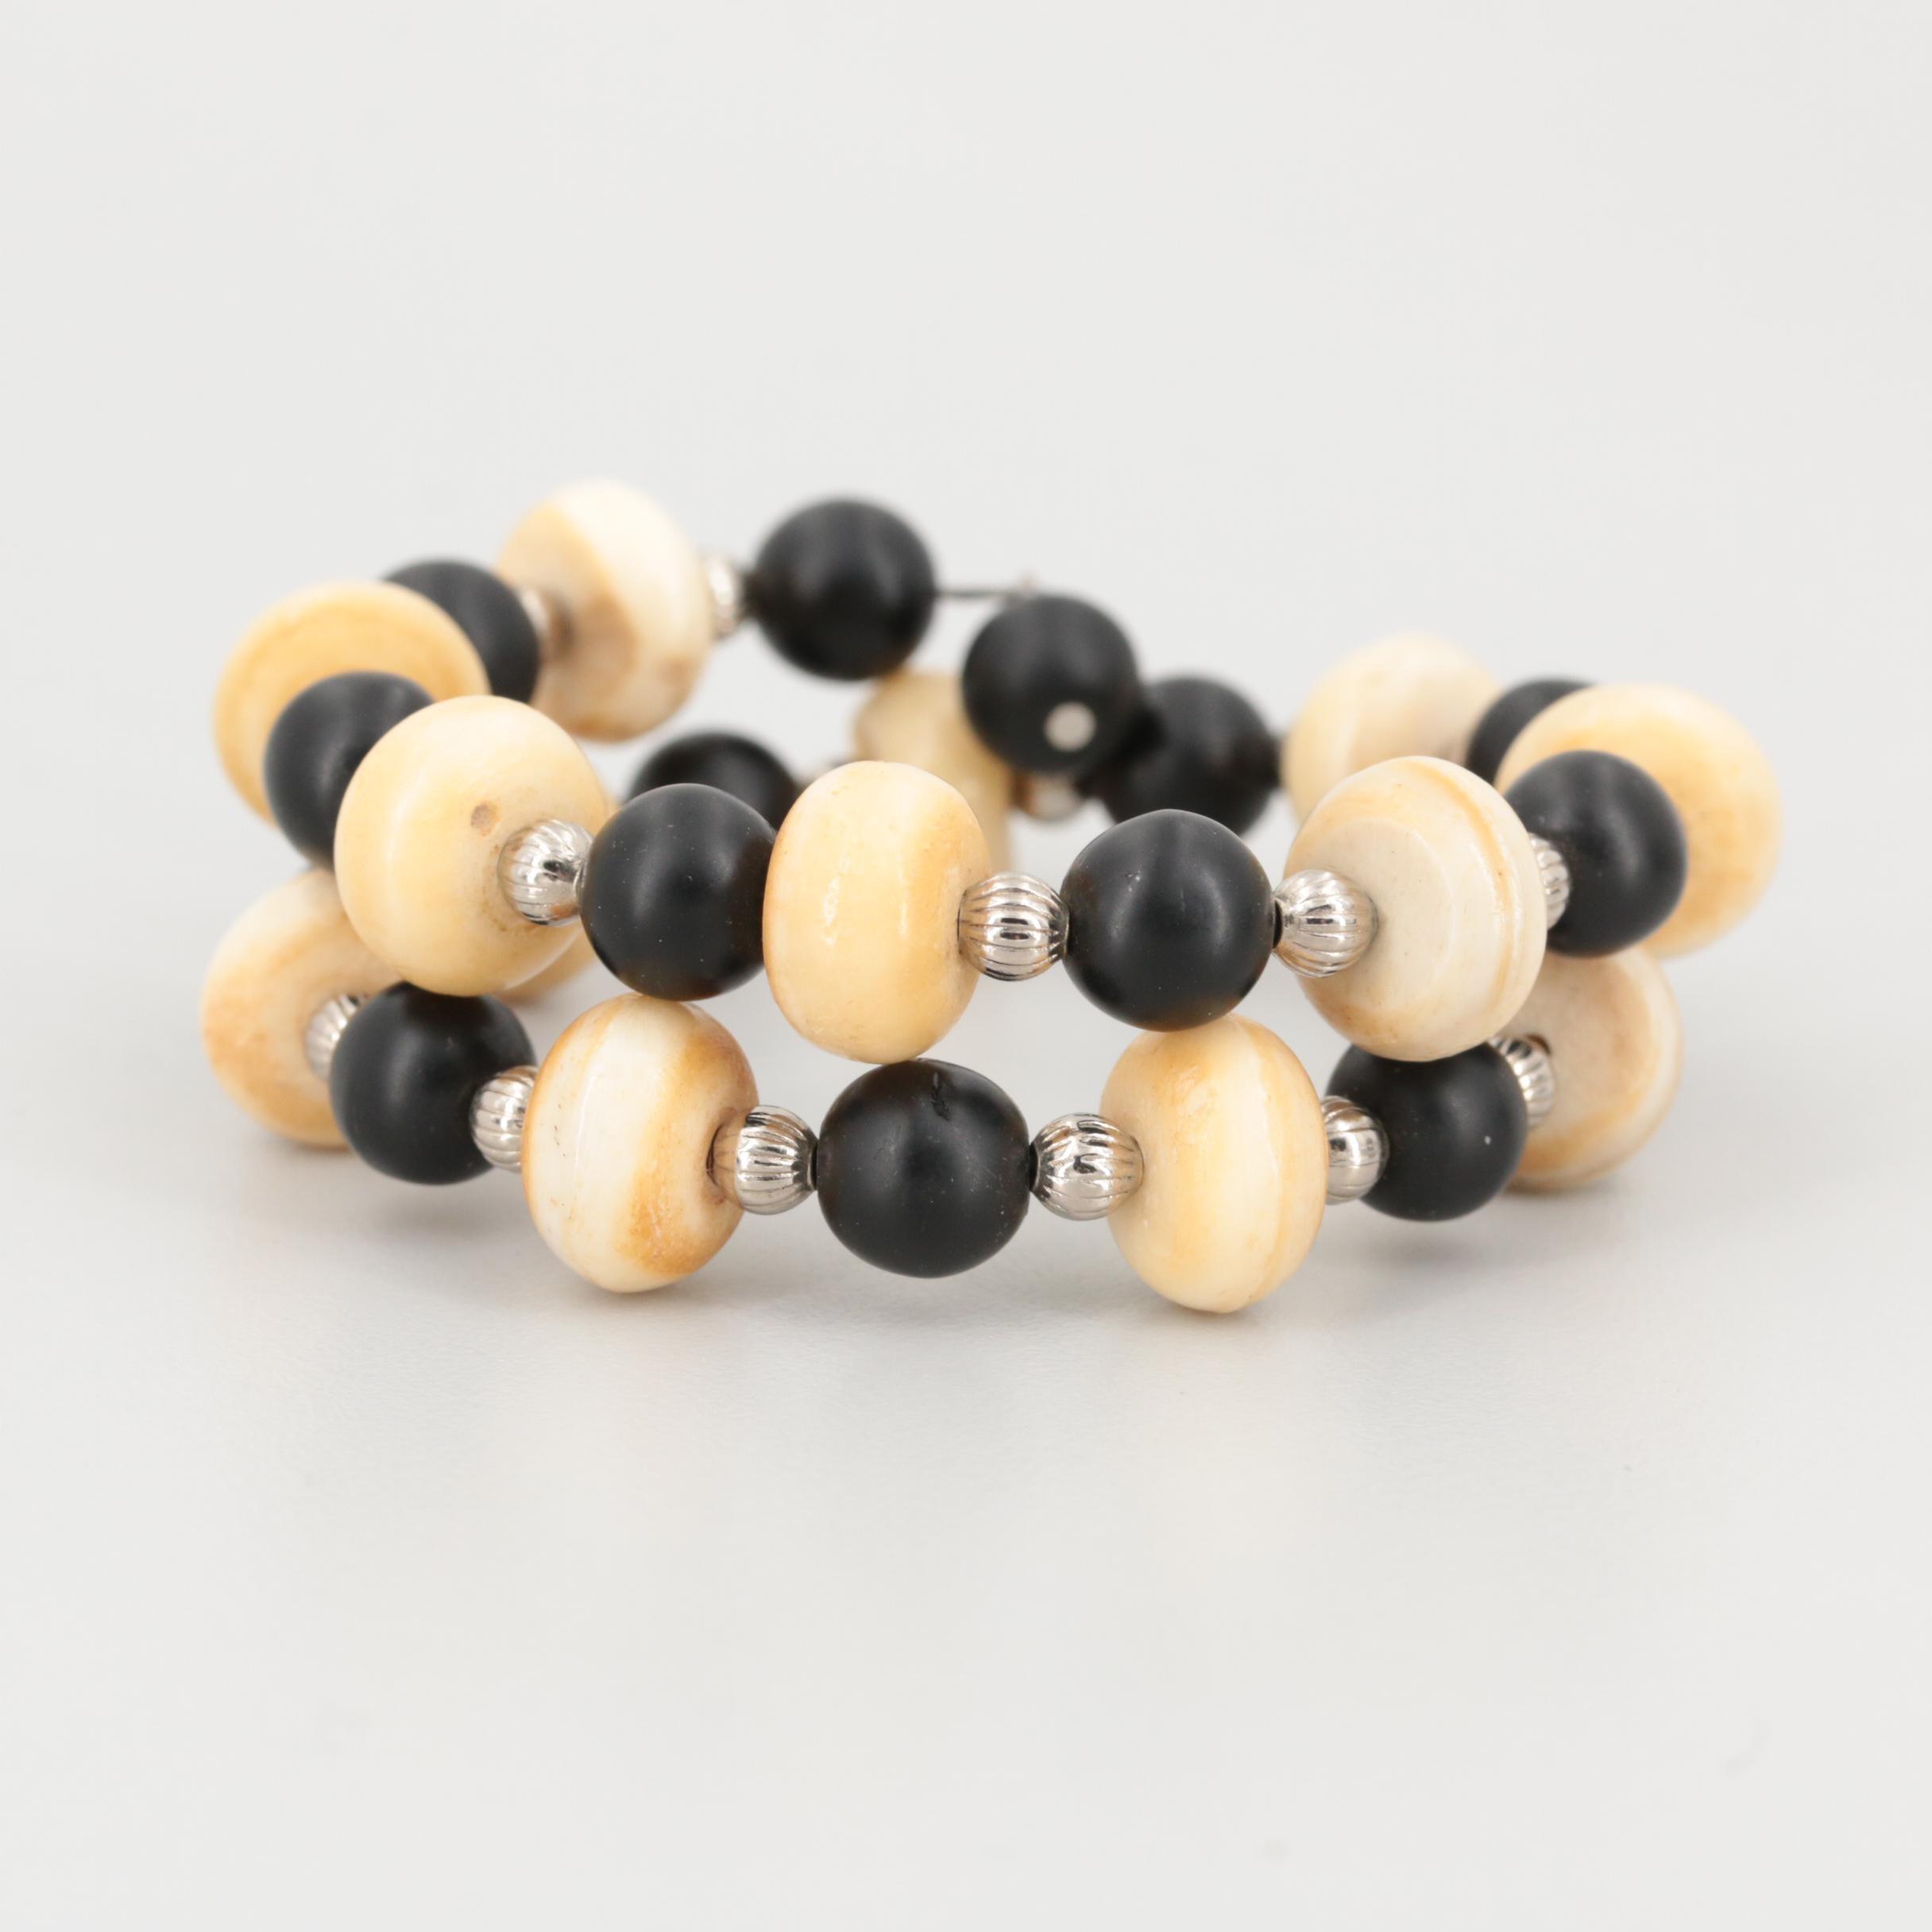 Silver Tone Bone and Resin Wrap Bracelet